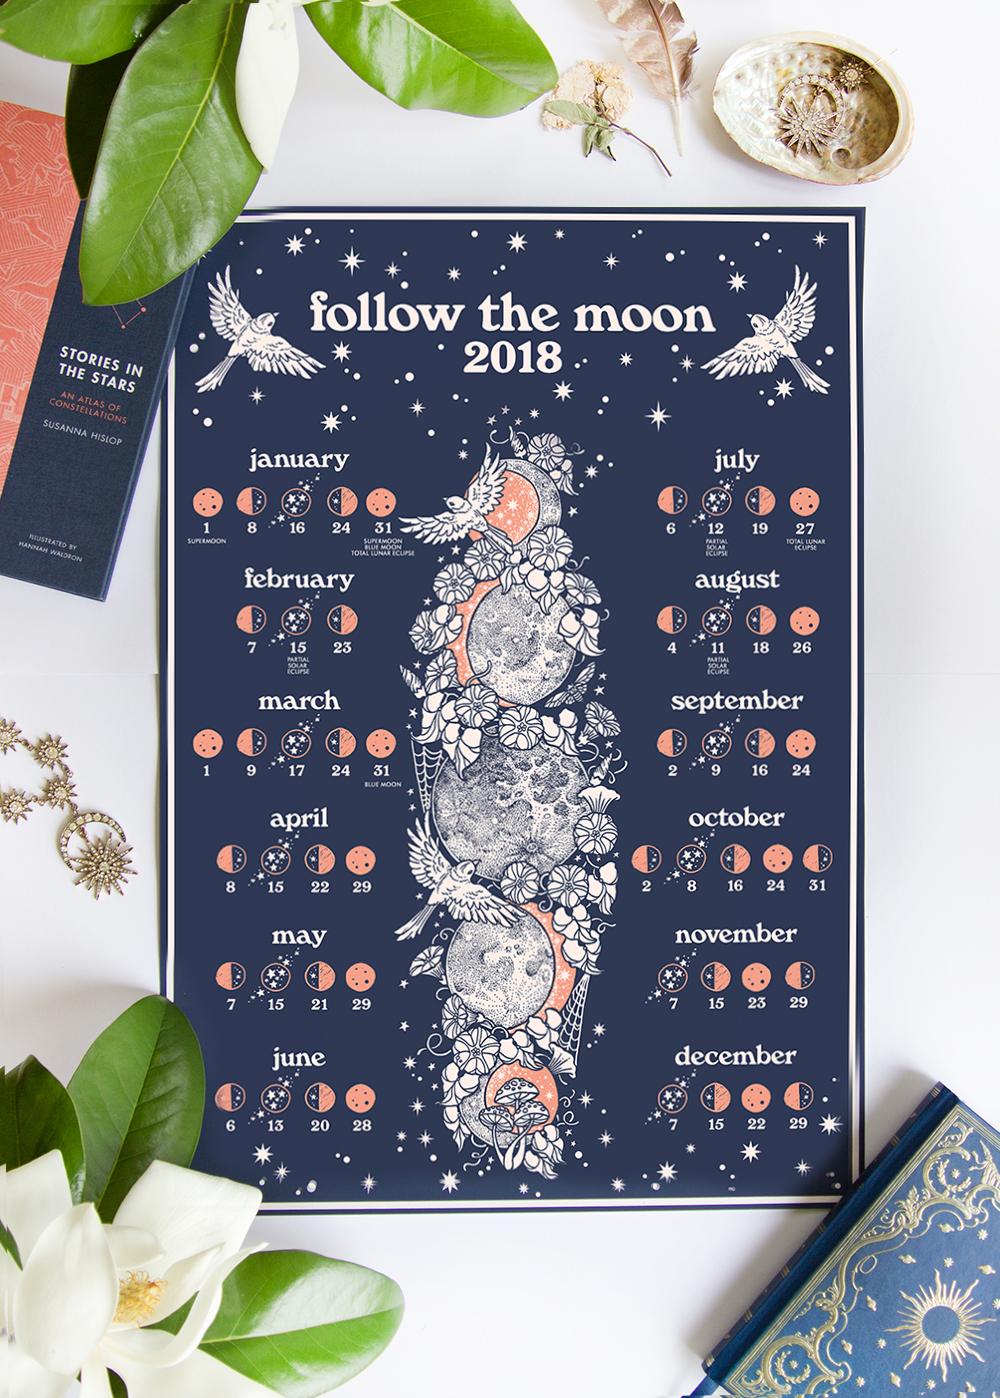 Lunarcalendar2018-web3-US.jpg